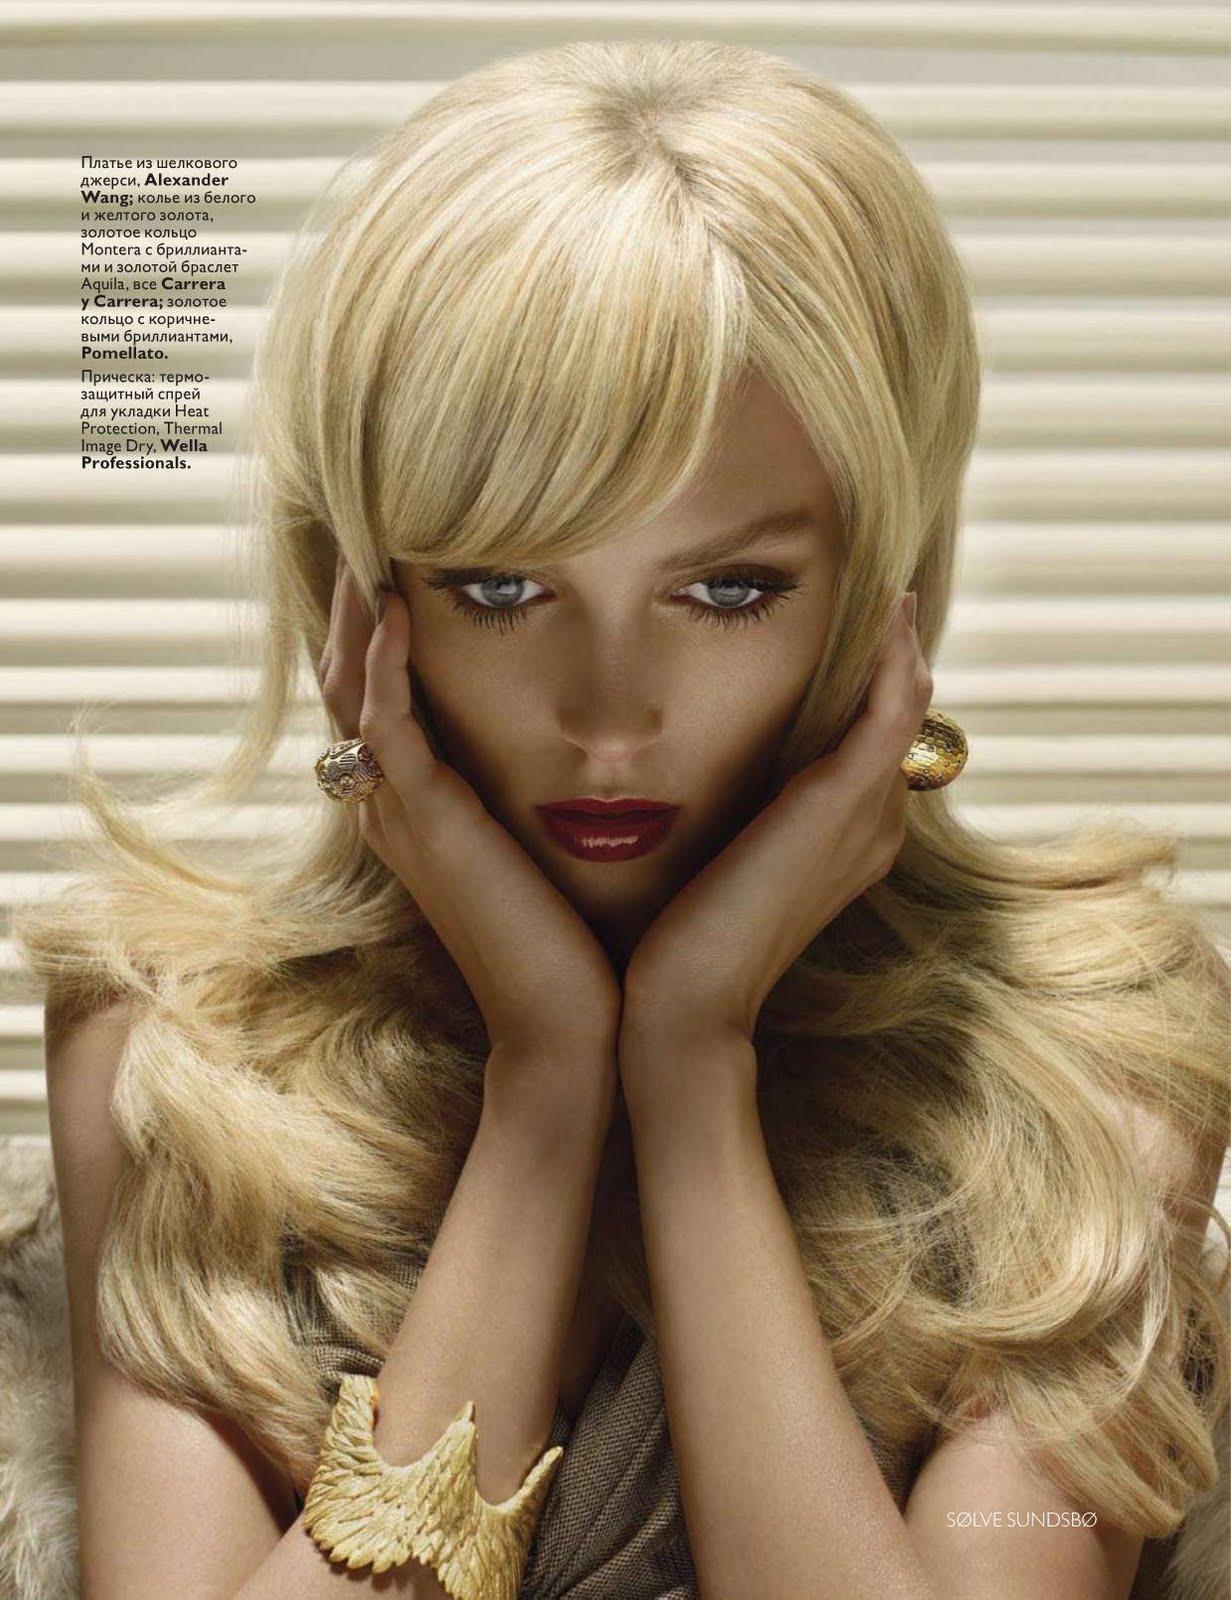 http://4.bp.blogspot.com/_mf2NYHWGS3s/TMSMjCJhI-I/AAAAAAAAMFU/cAszlx6gGLw/s1600/Anja+Rubik+by+S%C3%B8lve+Sundsb%C3%B8+(Editorial+-+Vogue+Russia+November+2010).jpg